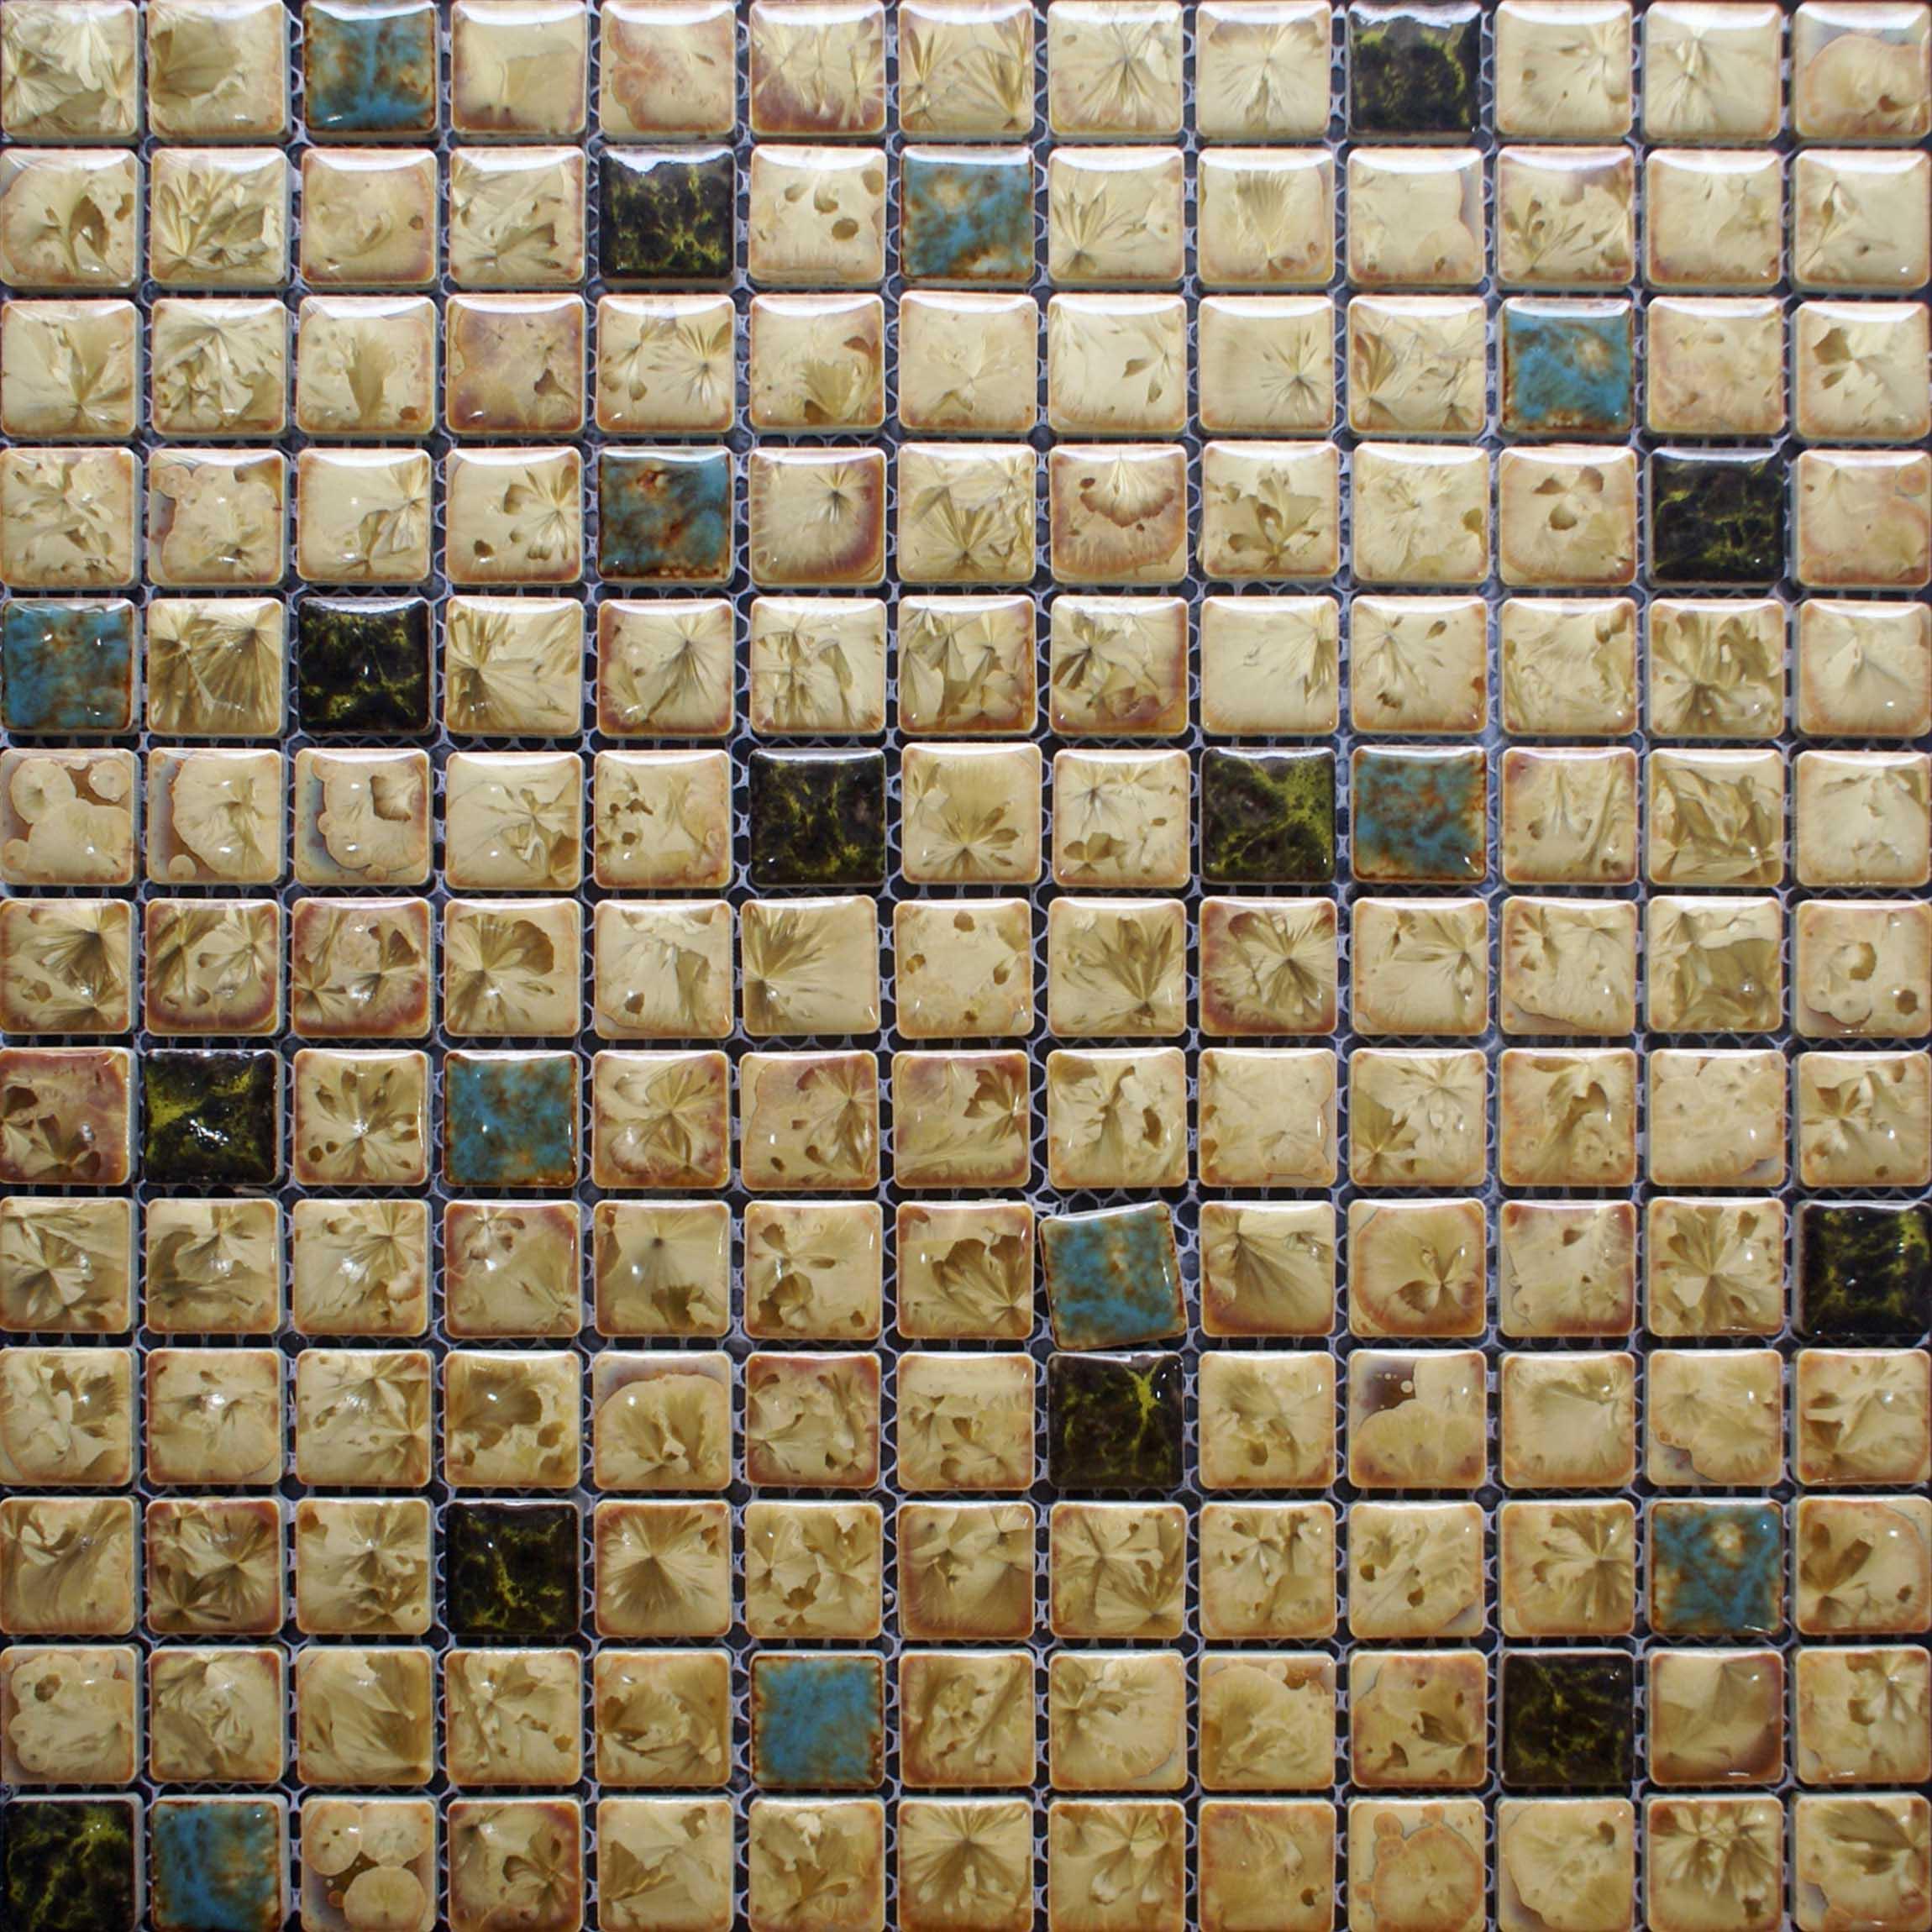 Backsplash tile porcelain mosaics bathroom wall stickers hs0037 - Blue And Whtie Porcelain Mosaic Tile Kitchen Backsplash